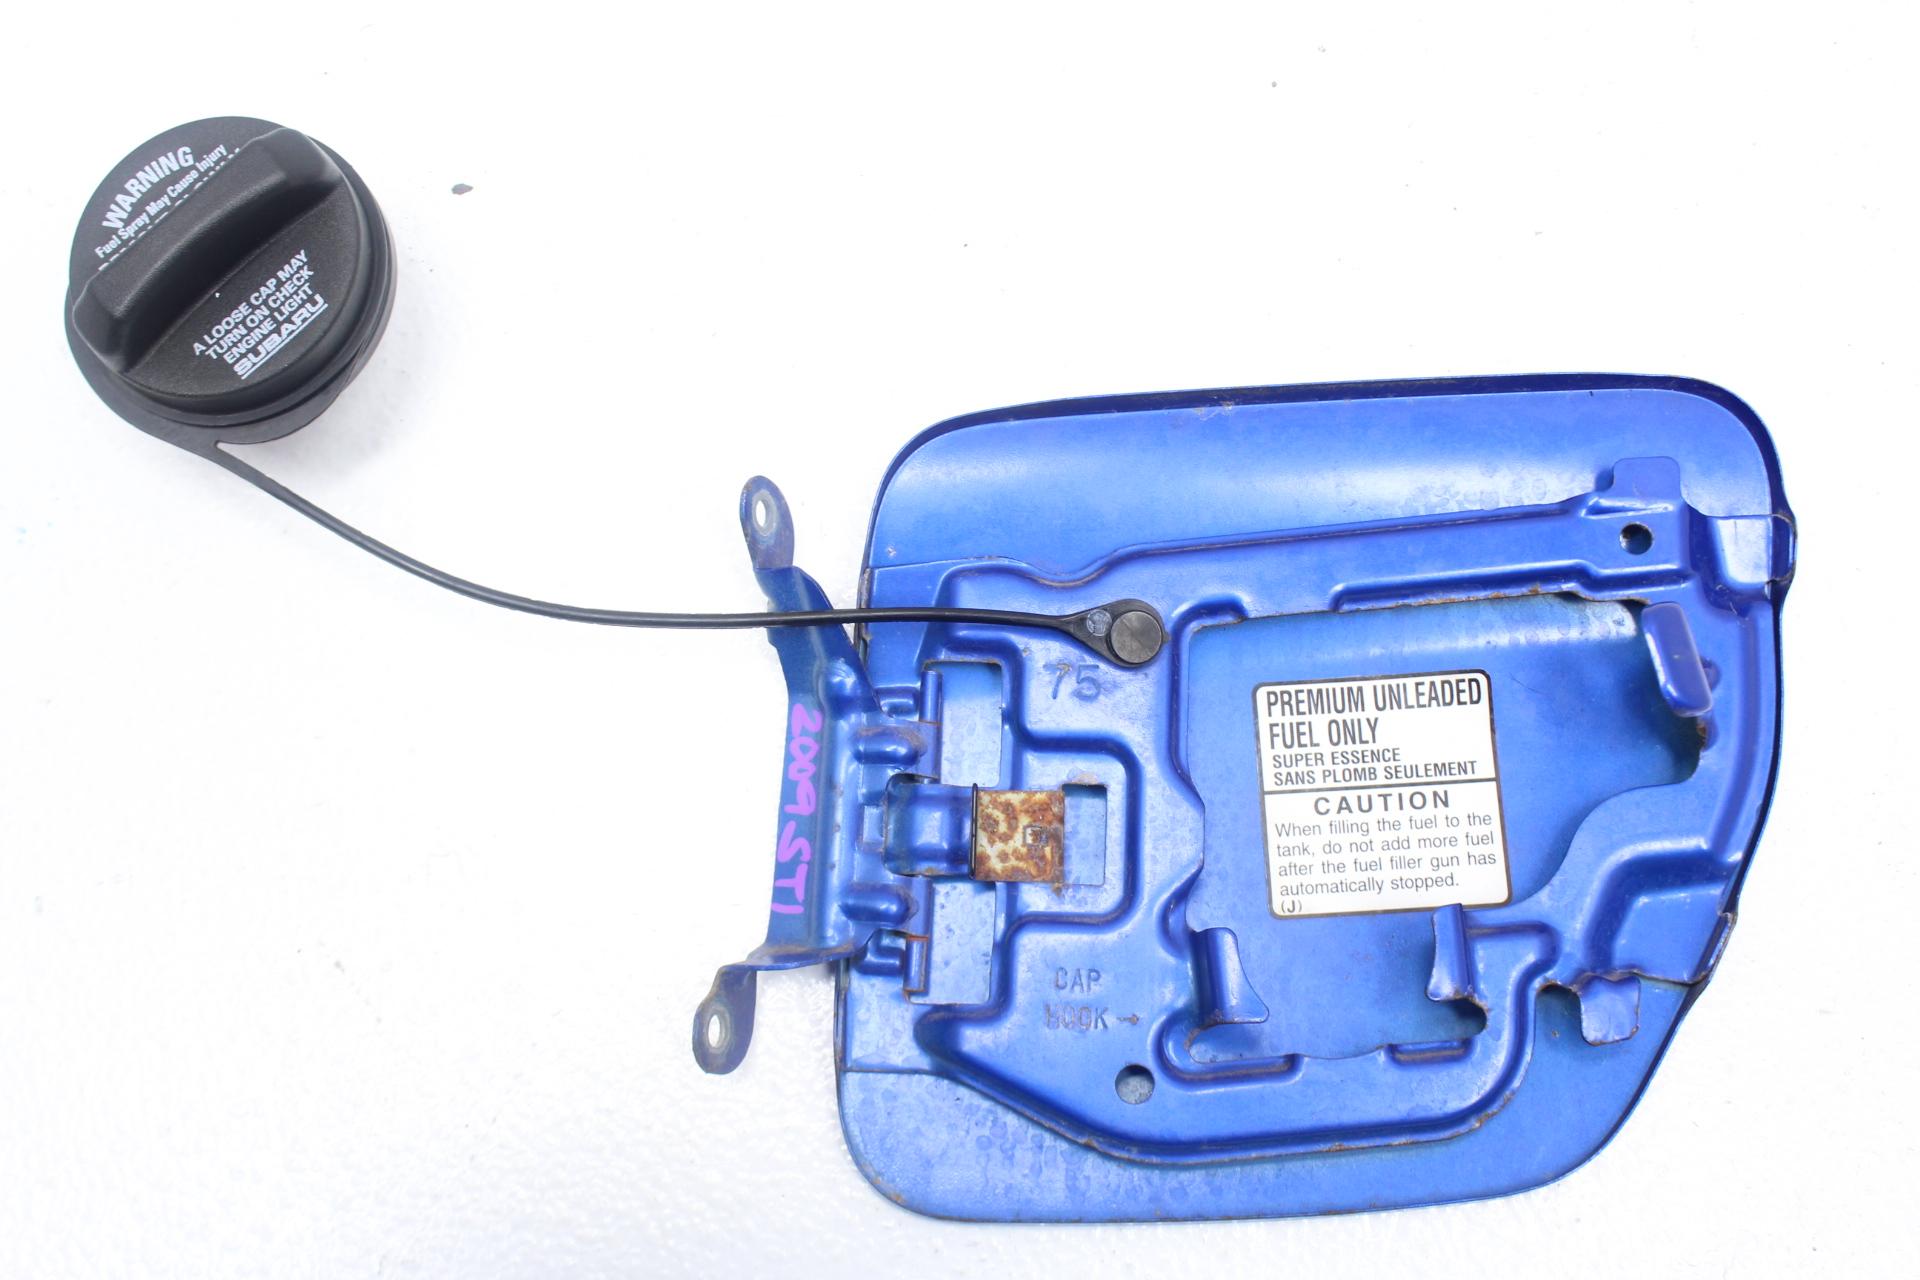 2008-2014 SUBARU IMPREZA WRX STI GAS CAP LID COVER ASSEMBLY OEM BLUE